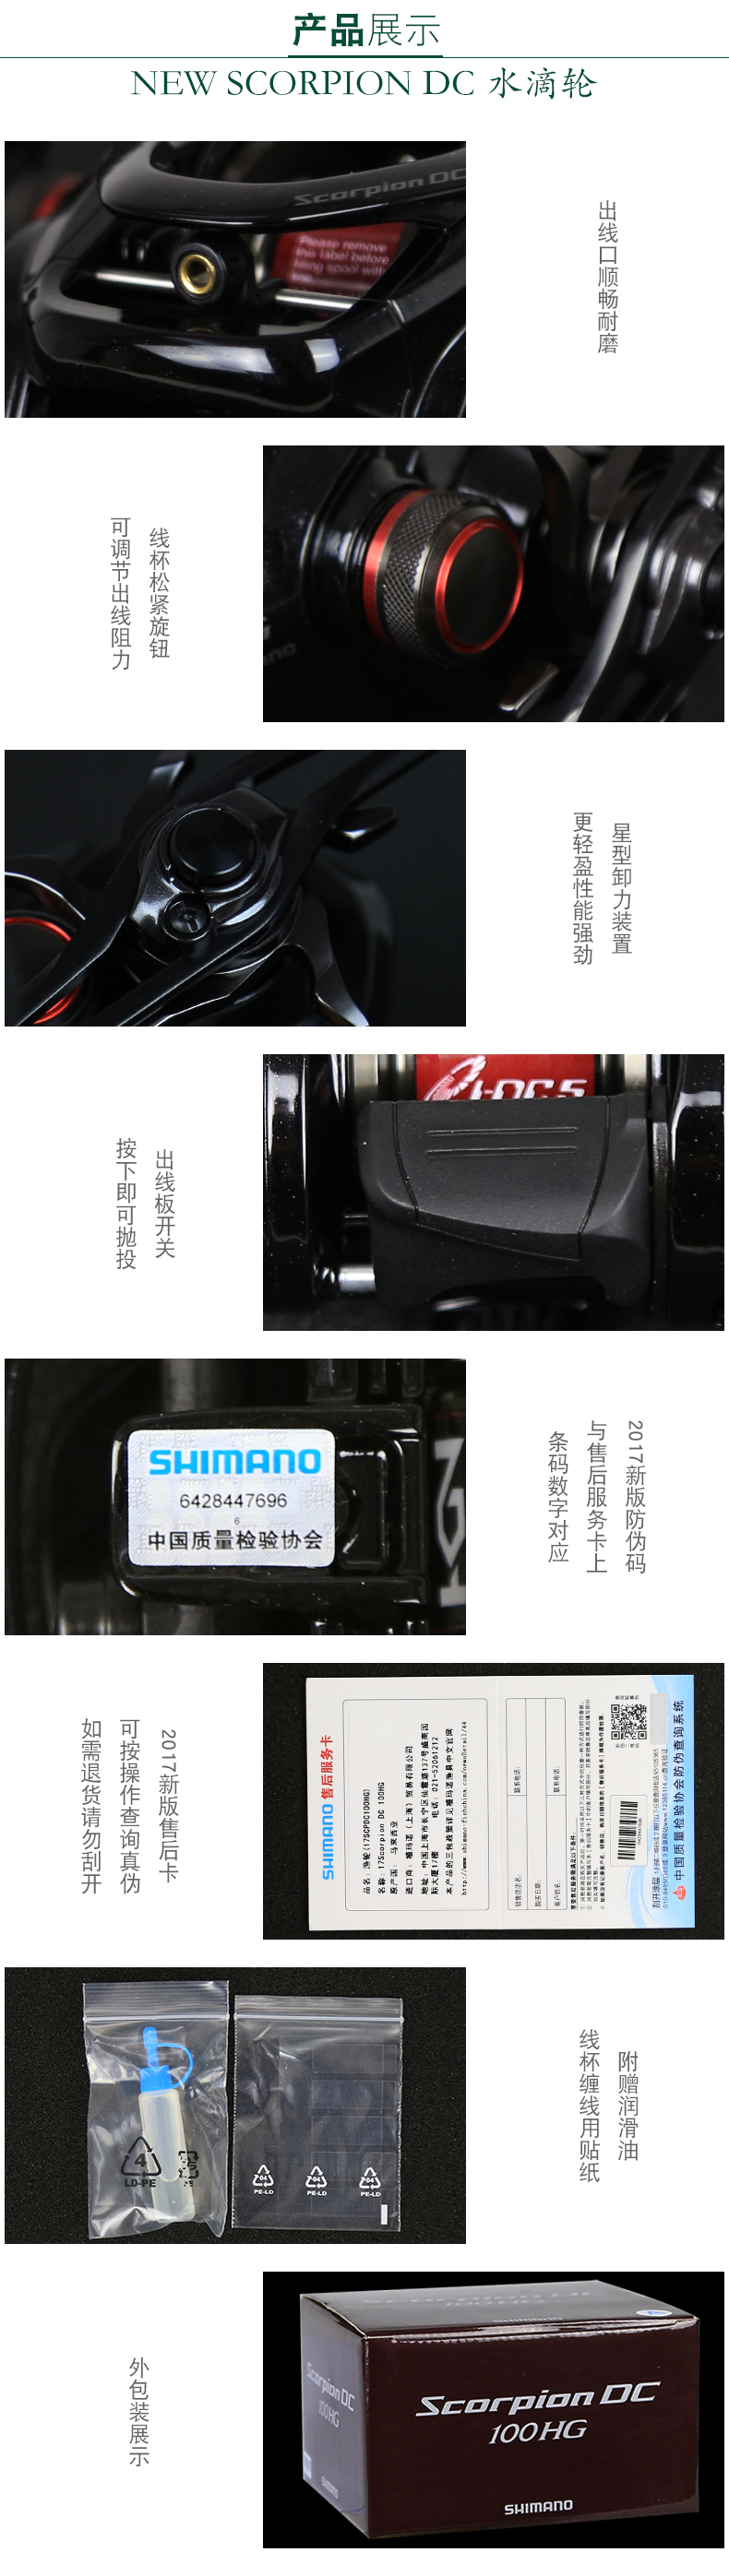 acqua SHIMANO 100HG Originale 3